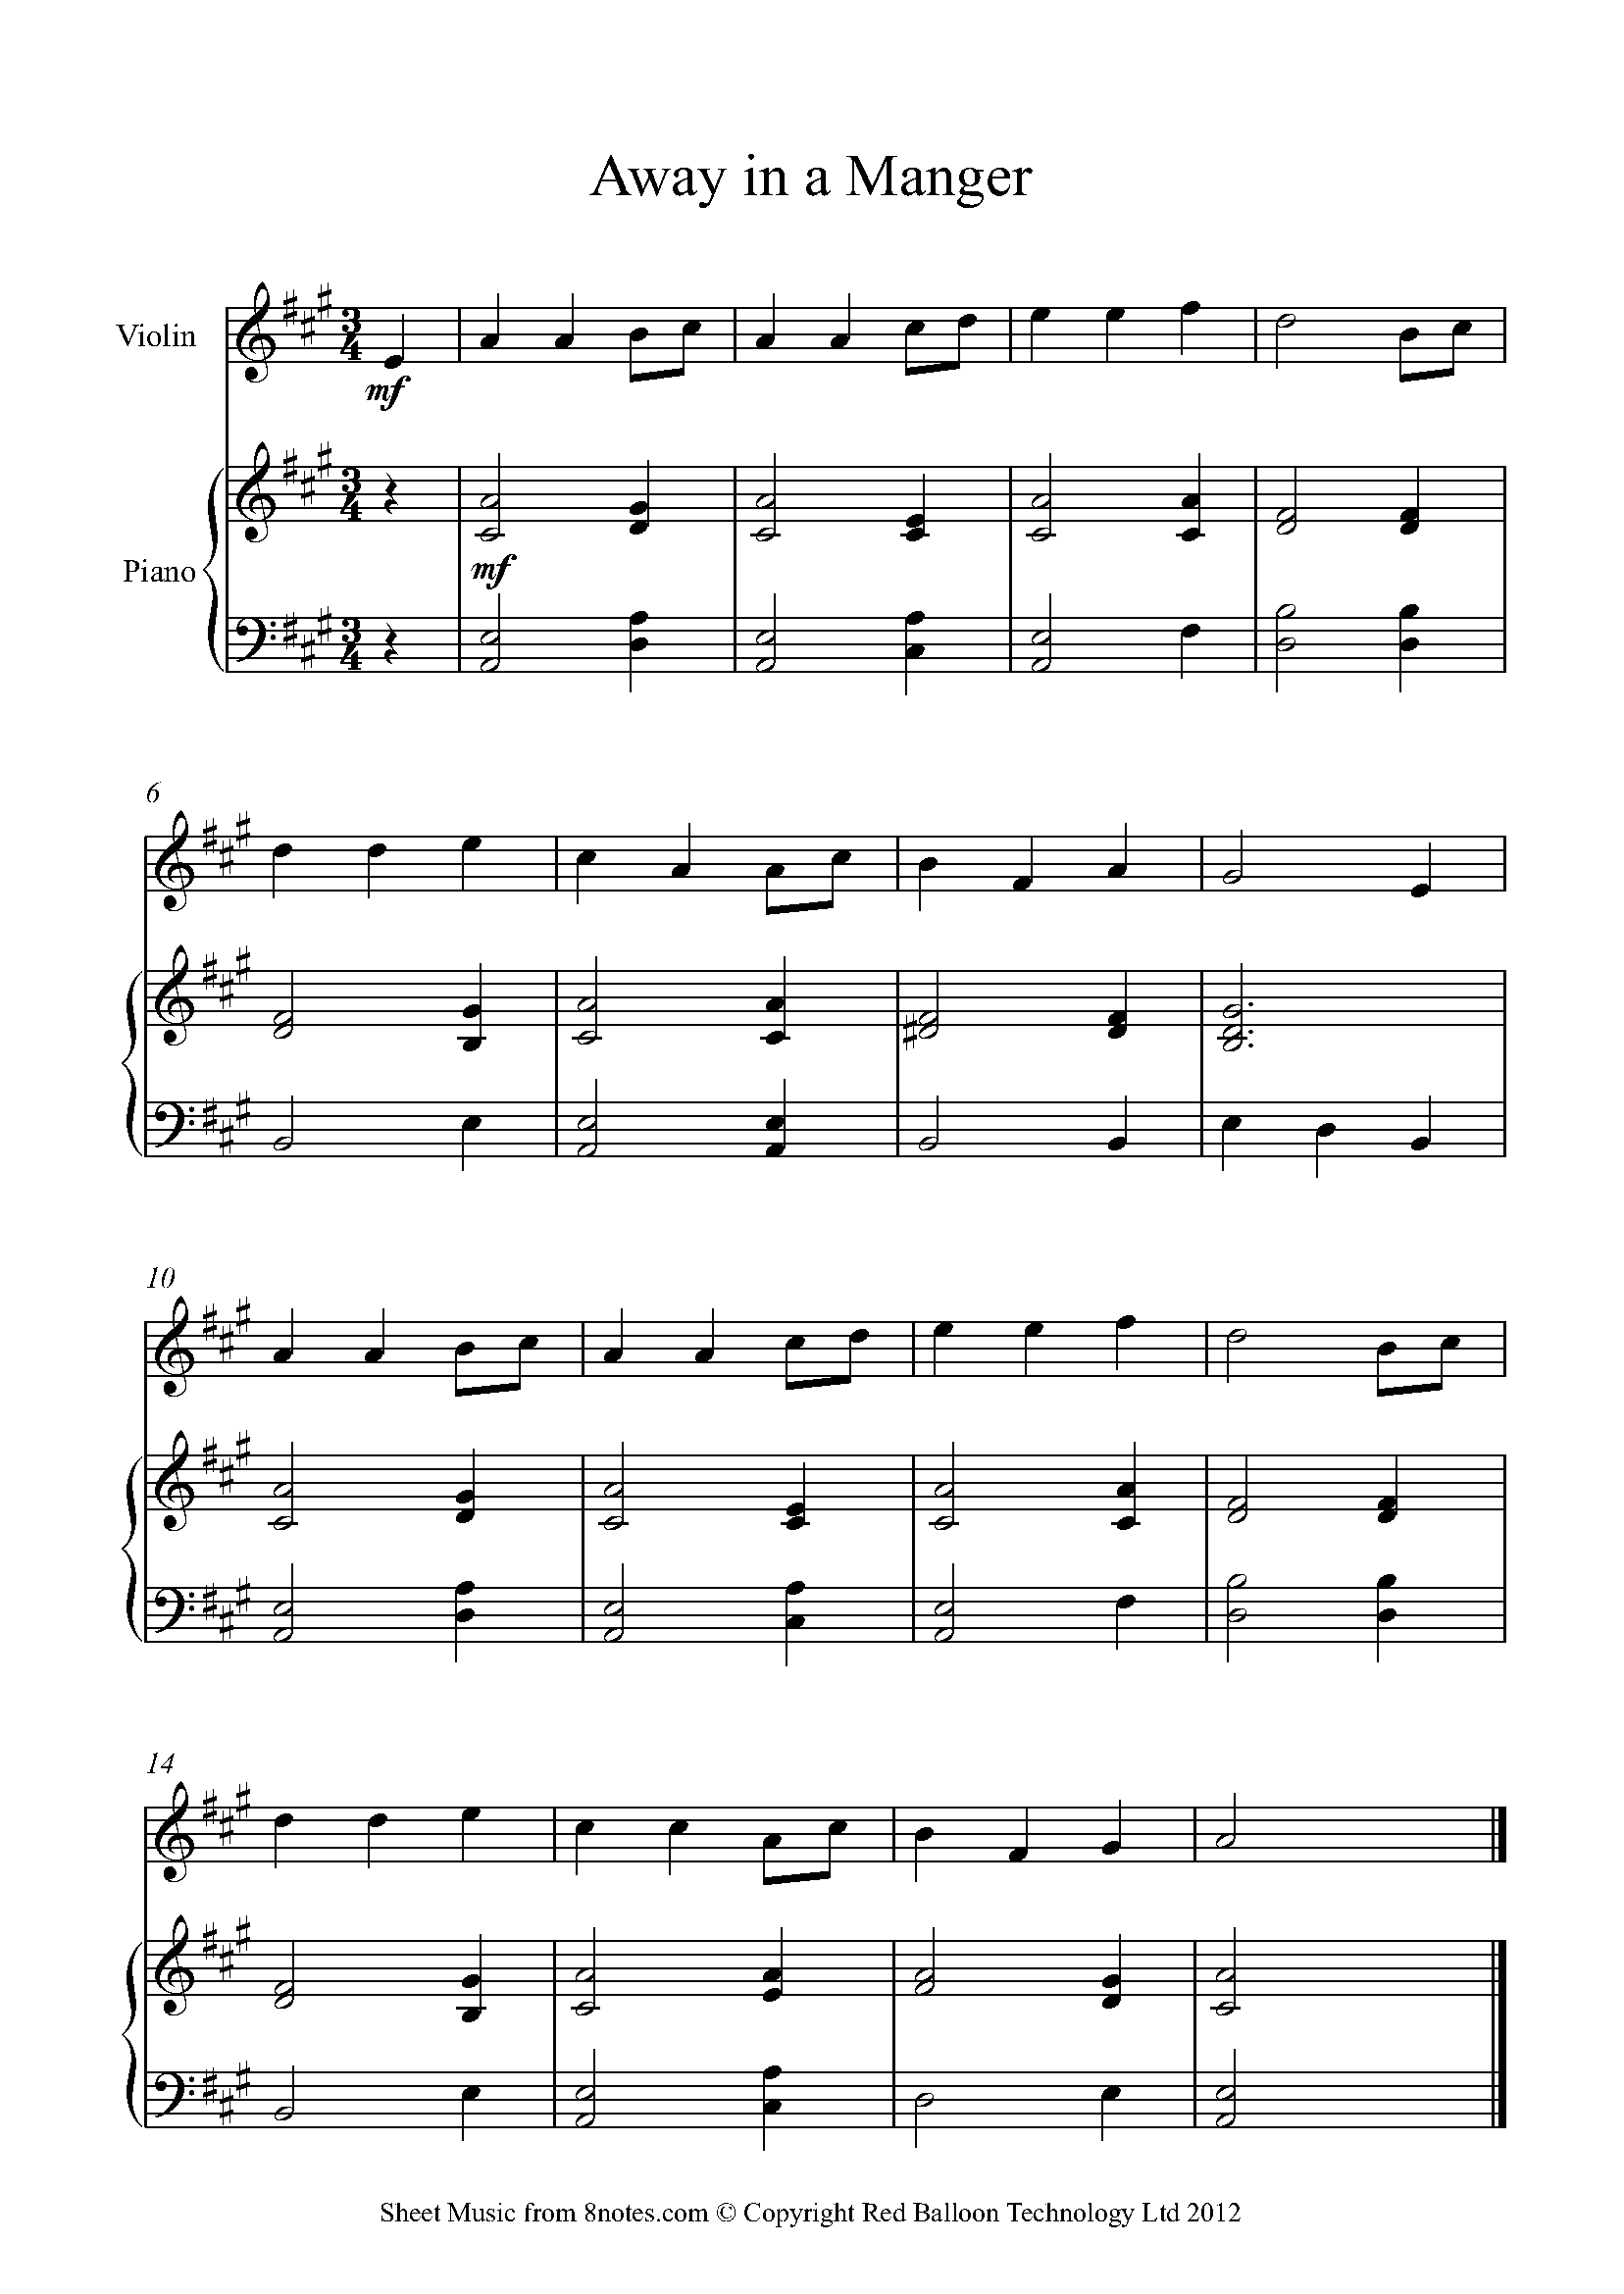 I Want A Hippopotamus For Christmas Sheet Music Free Pdf.Away In A Manger Sheet Music For Violin Free Violin Sheet